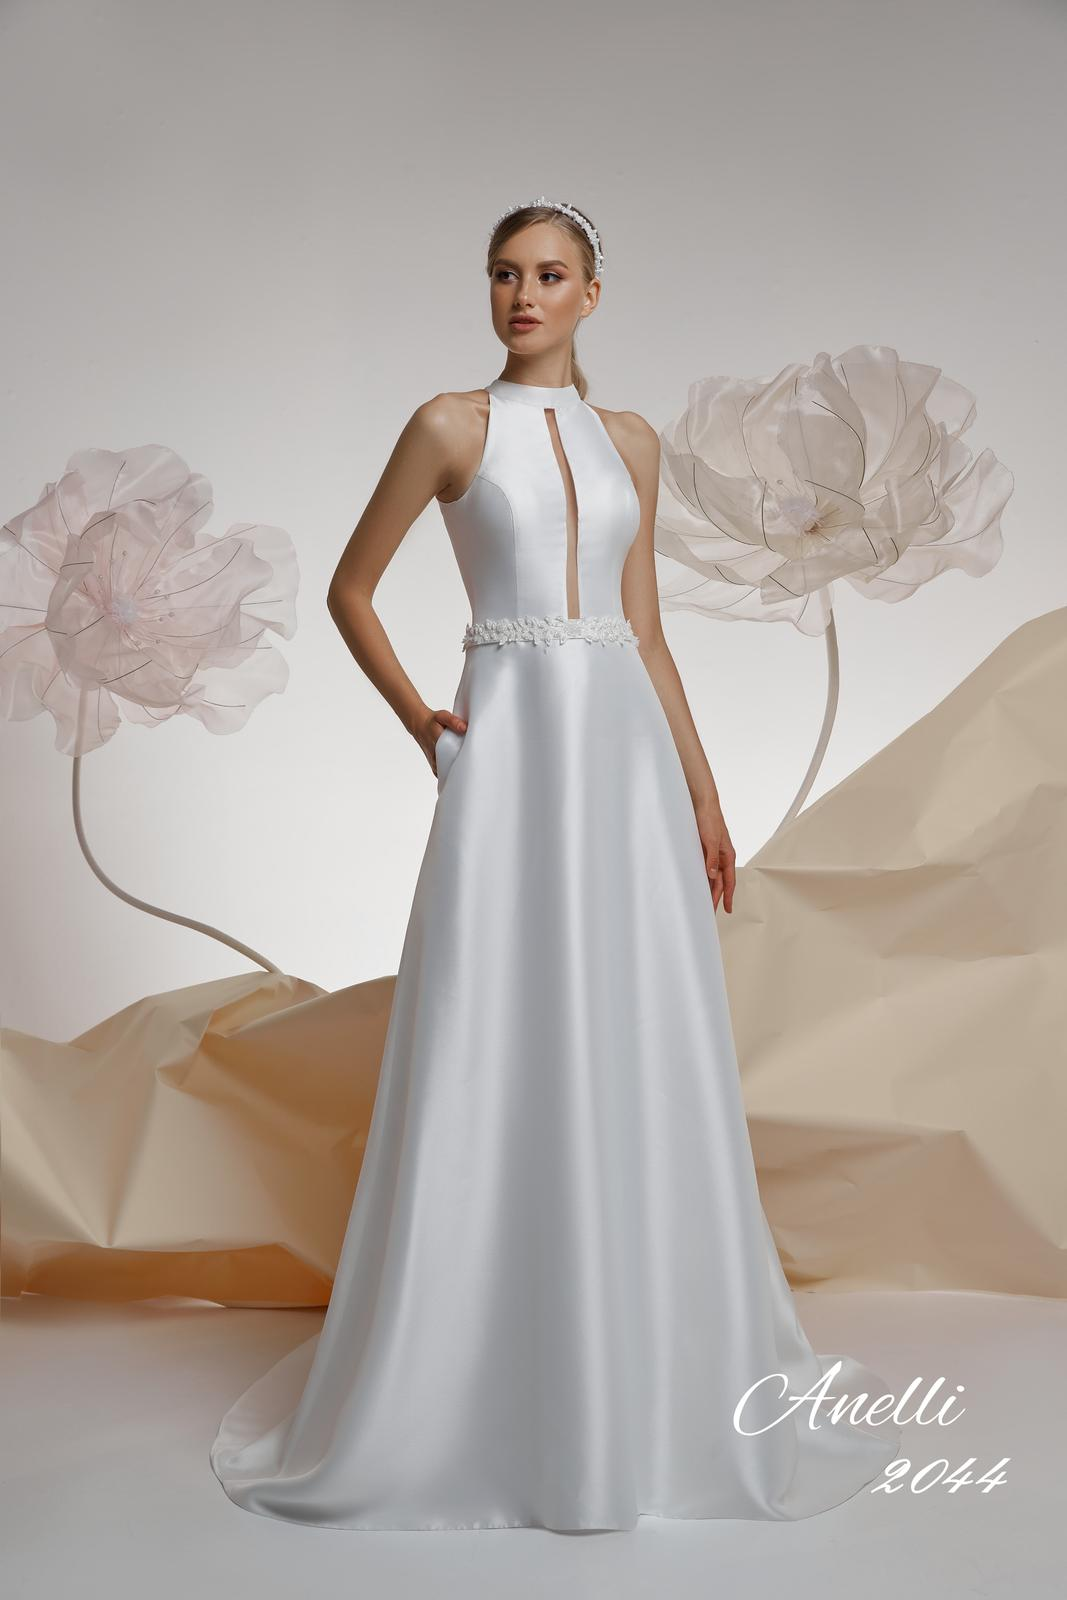 Svadobné šaty - Imagine 2044 - Obrázok č. 1